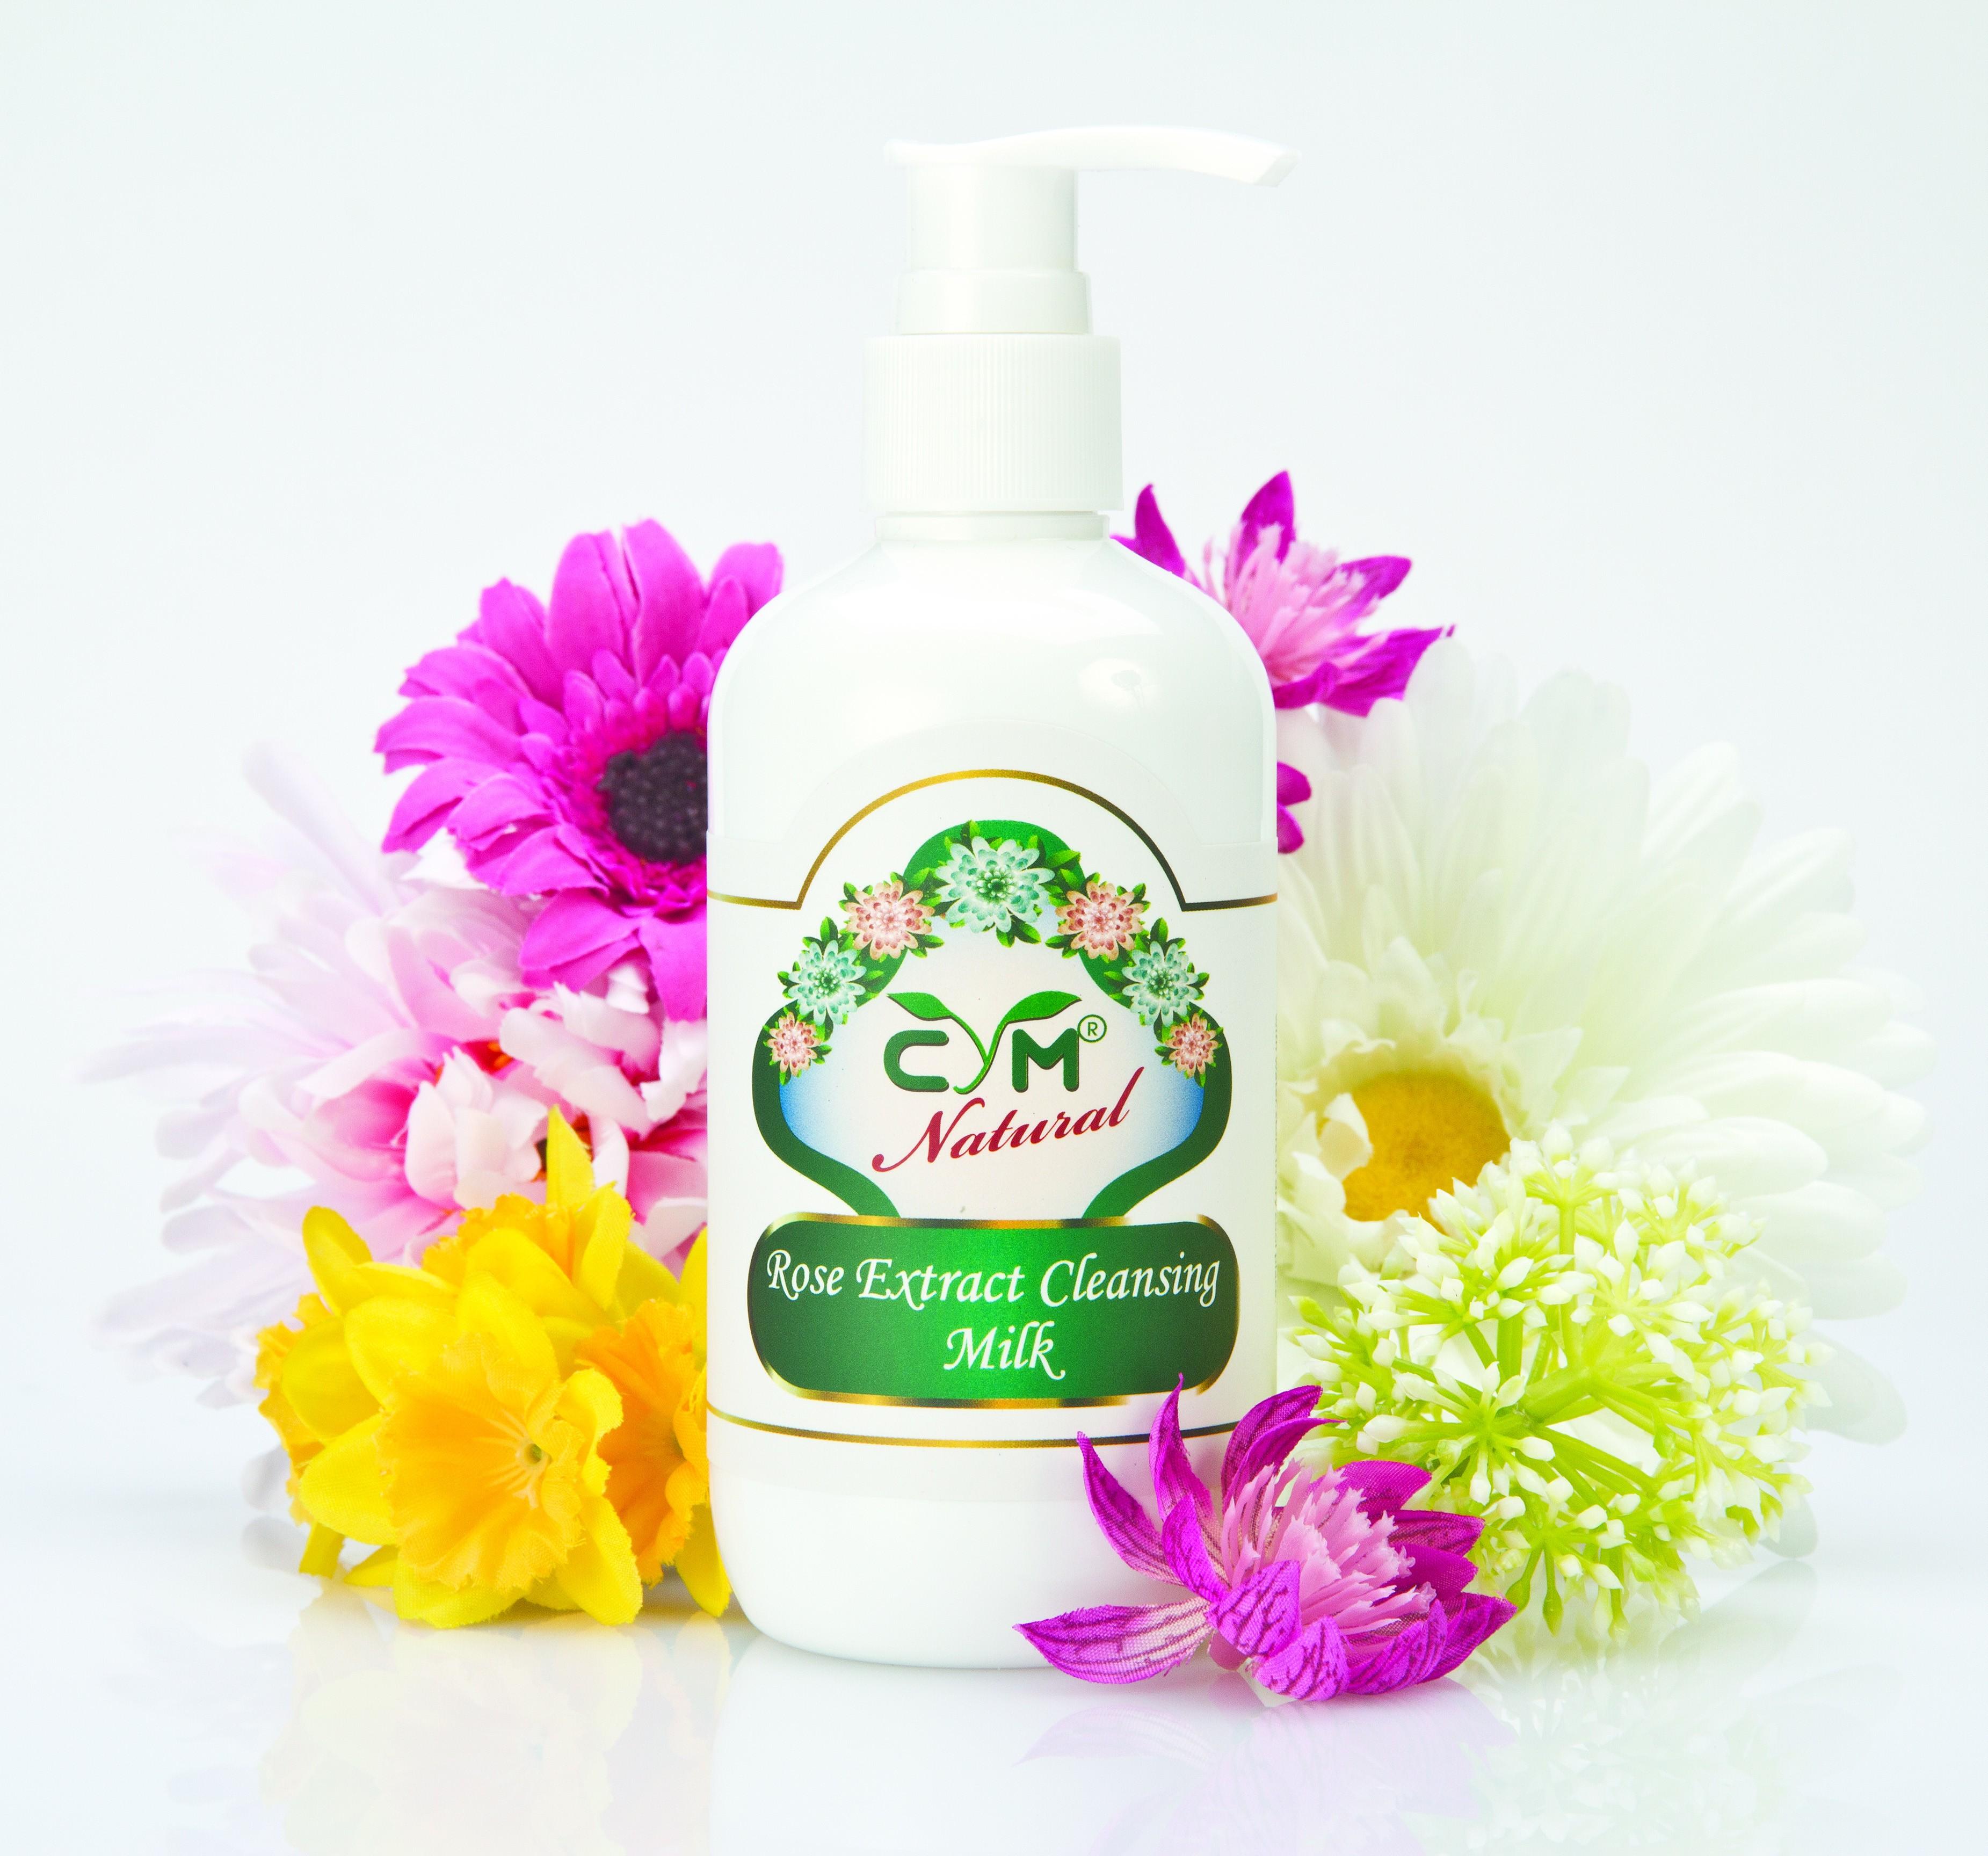 玫瑰精華潔面奶 Rose Extract Cleansing Milk - 500 ml - AMC-818